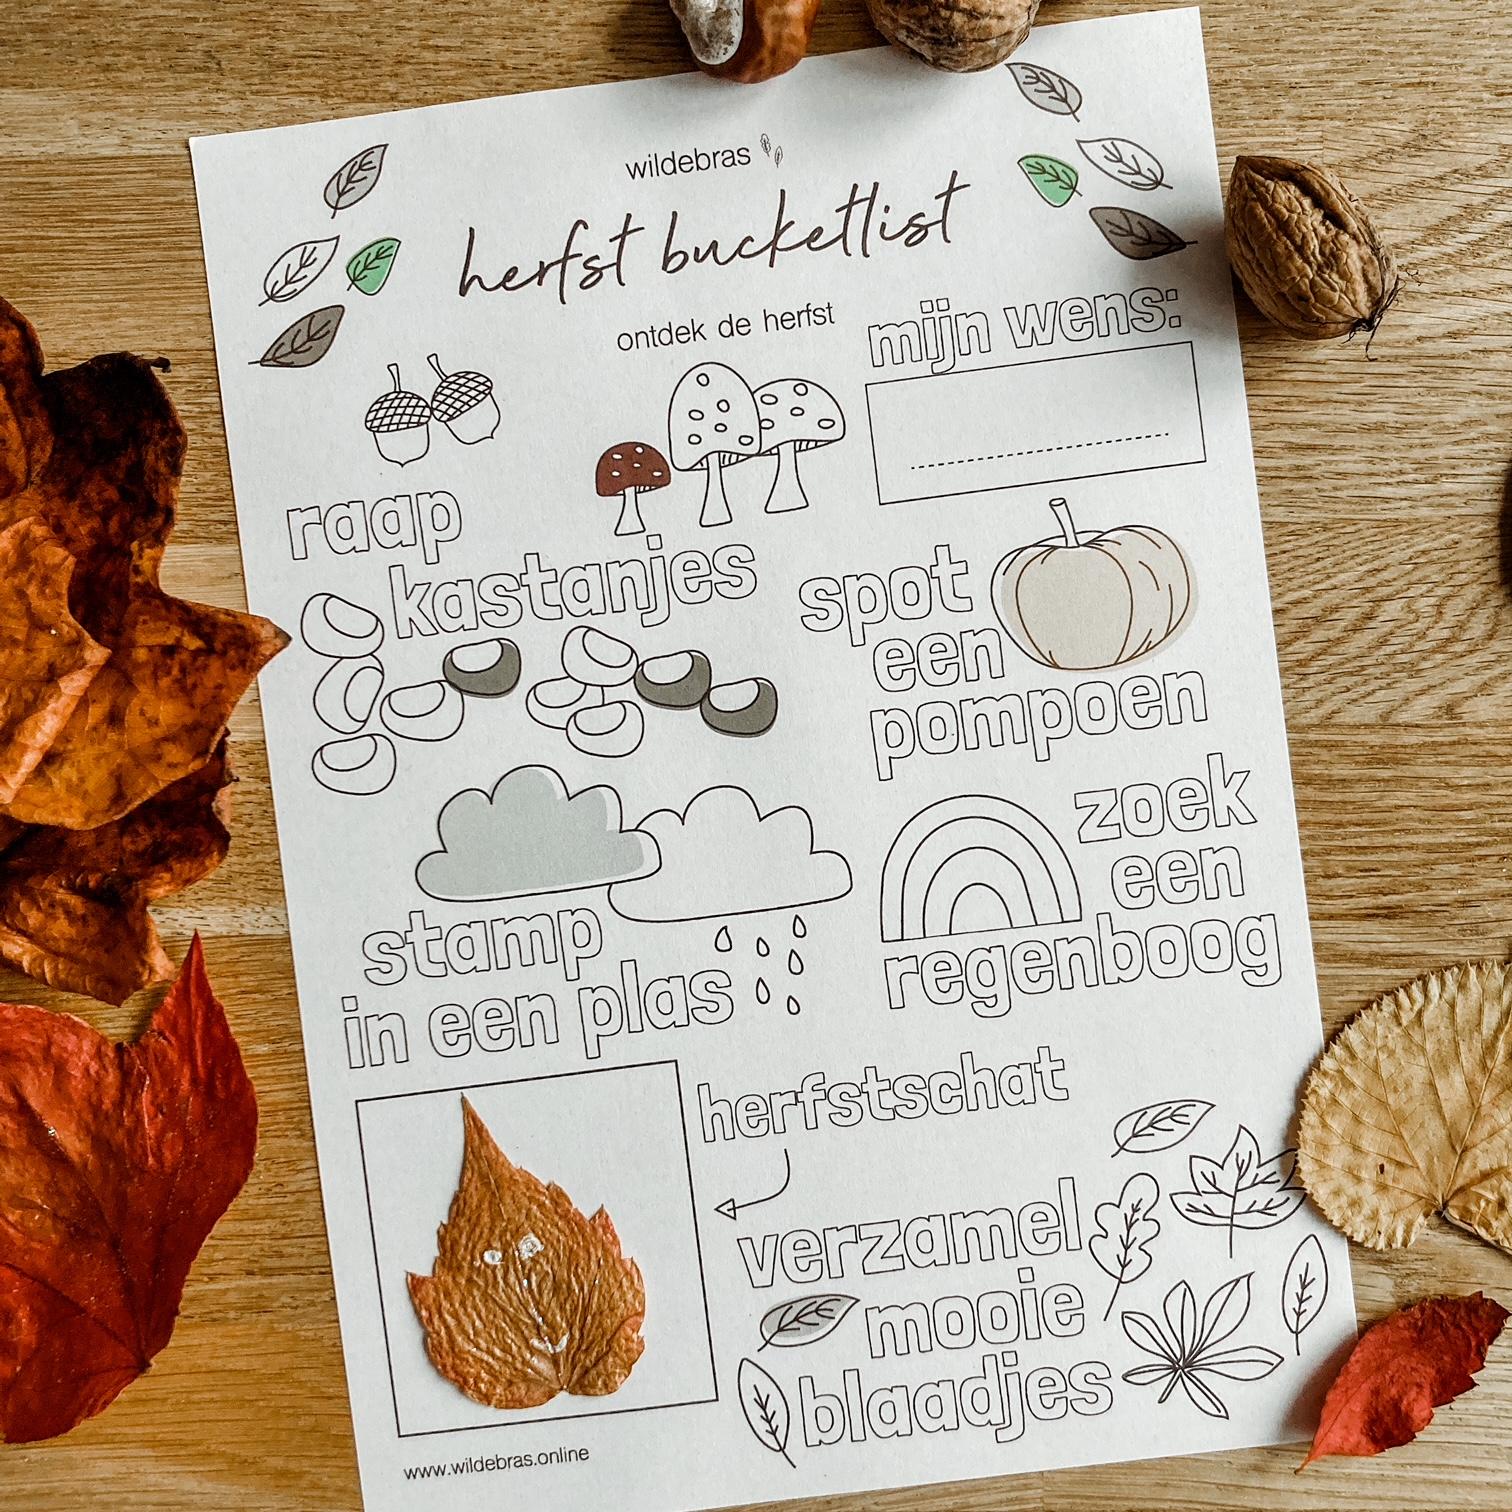 herfst bucketlist printable